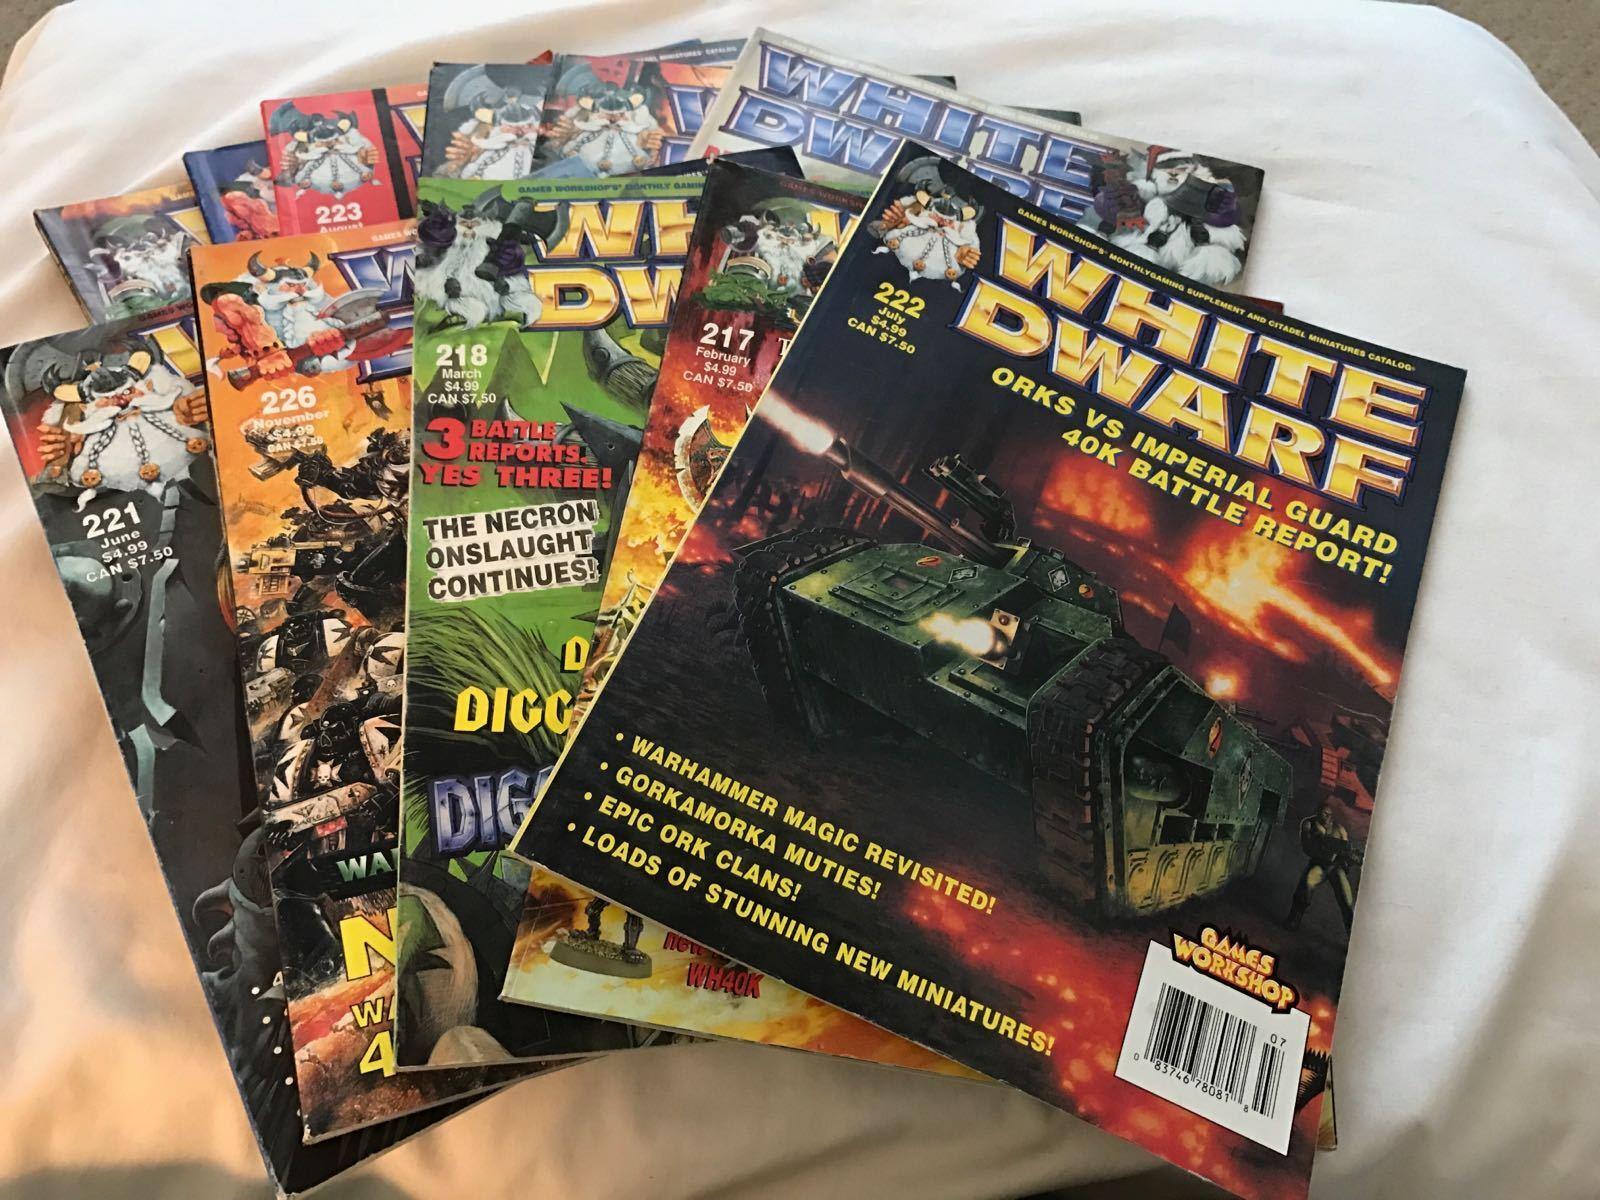 LOT OF 11 GAMES WORKSHOP WHITE DWARF WARHAMMER 40K MAGAZINES ISSUES 217-228 1998